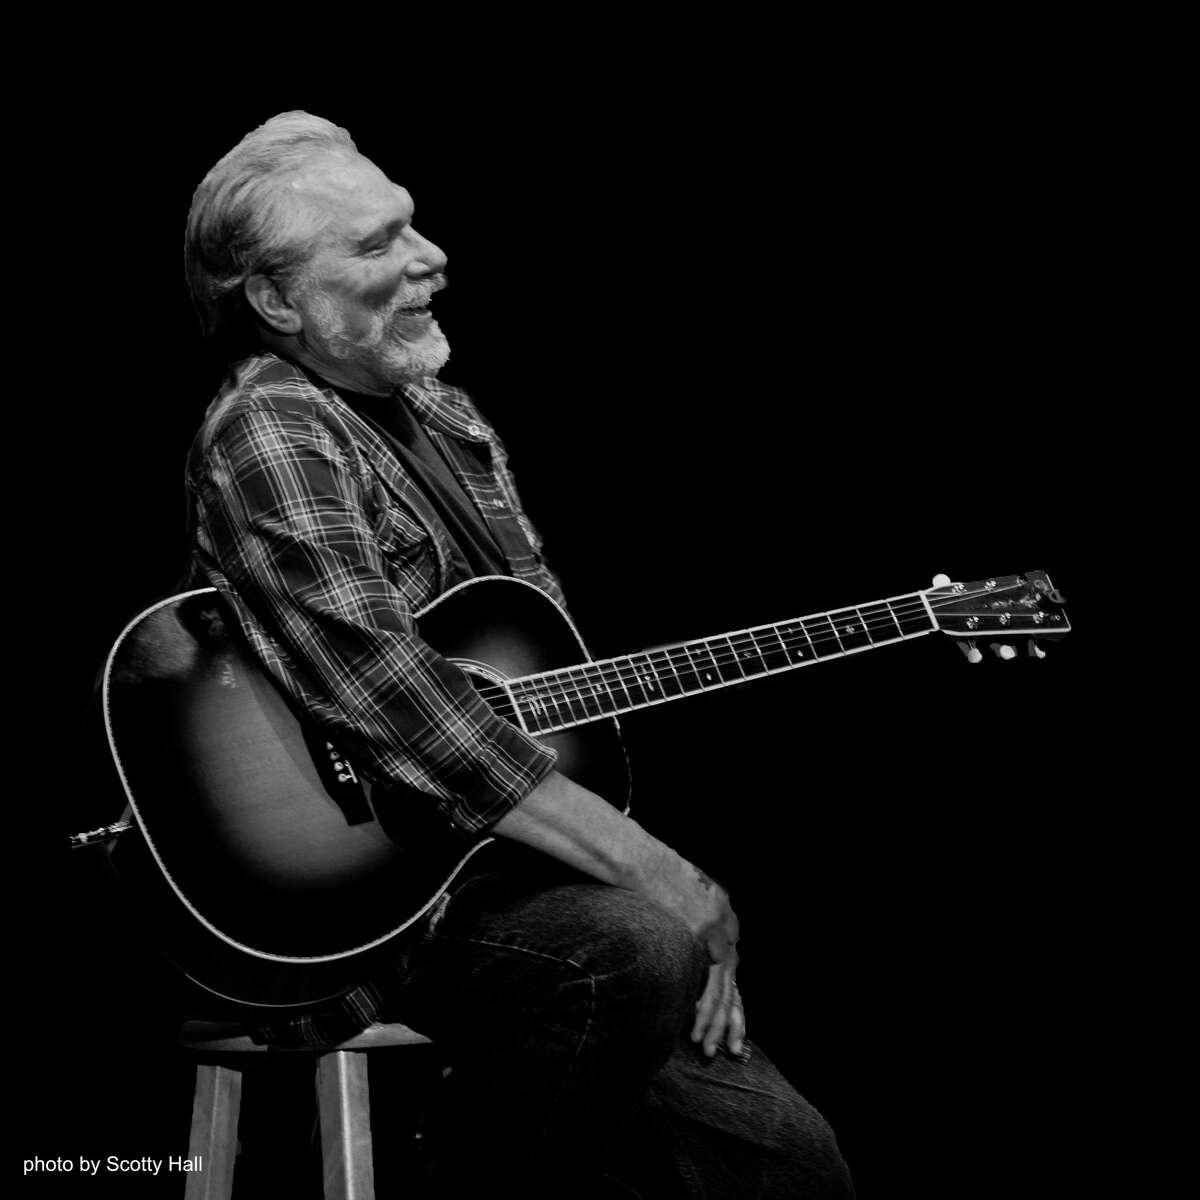 Jorma Kaukonen, Oct. 24, 4 and 7:30 p.m., Ridgefield Playhouse, 80 E. Ridge Rd., Ridgefield. Tickets: $45. Info: www.ridgefieldplayhouse.org, 203-438-5795.